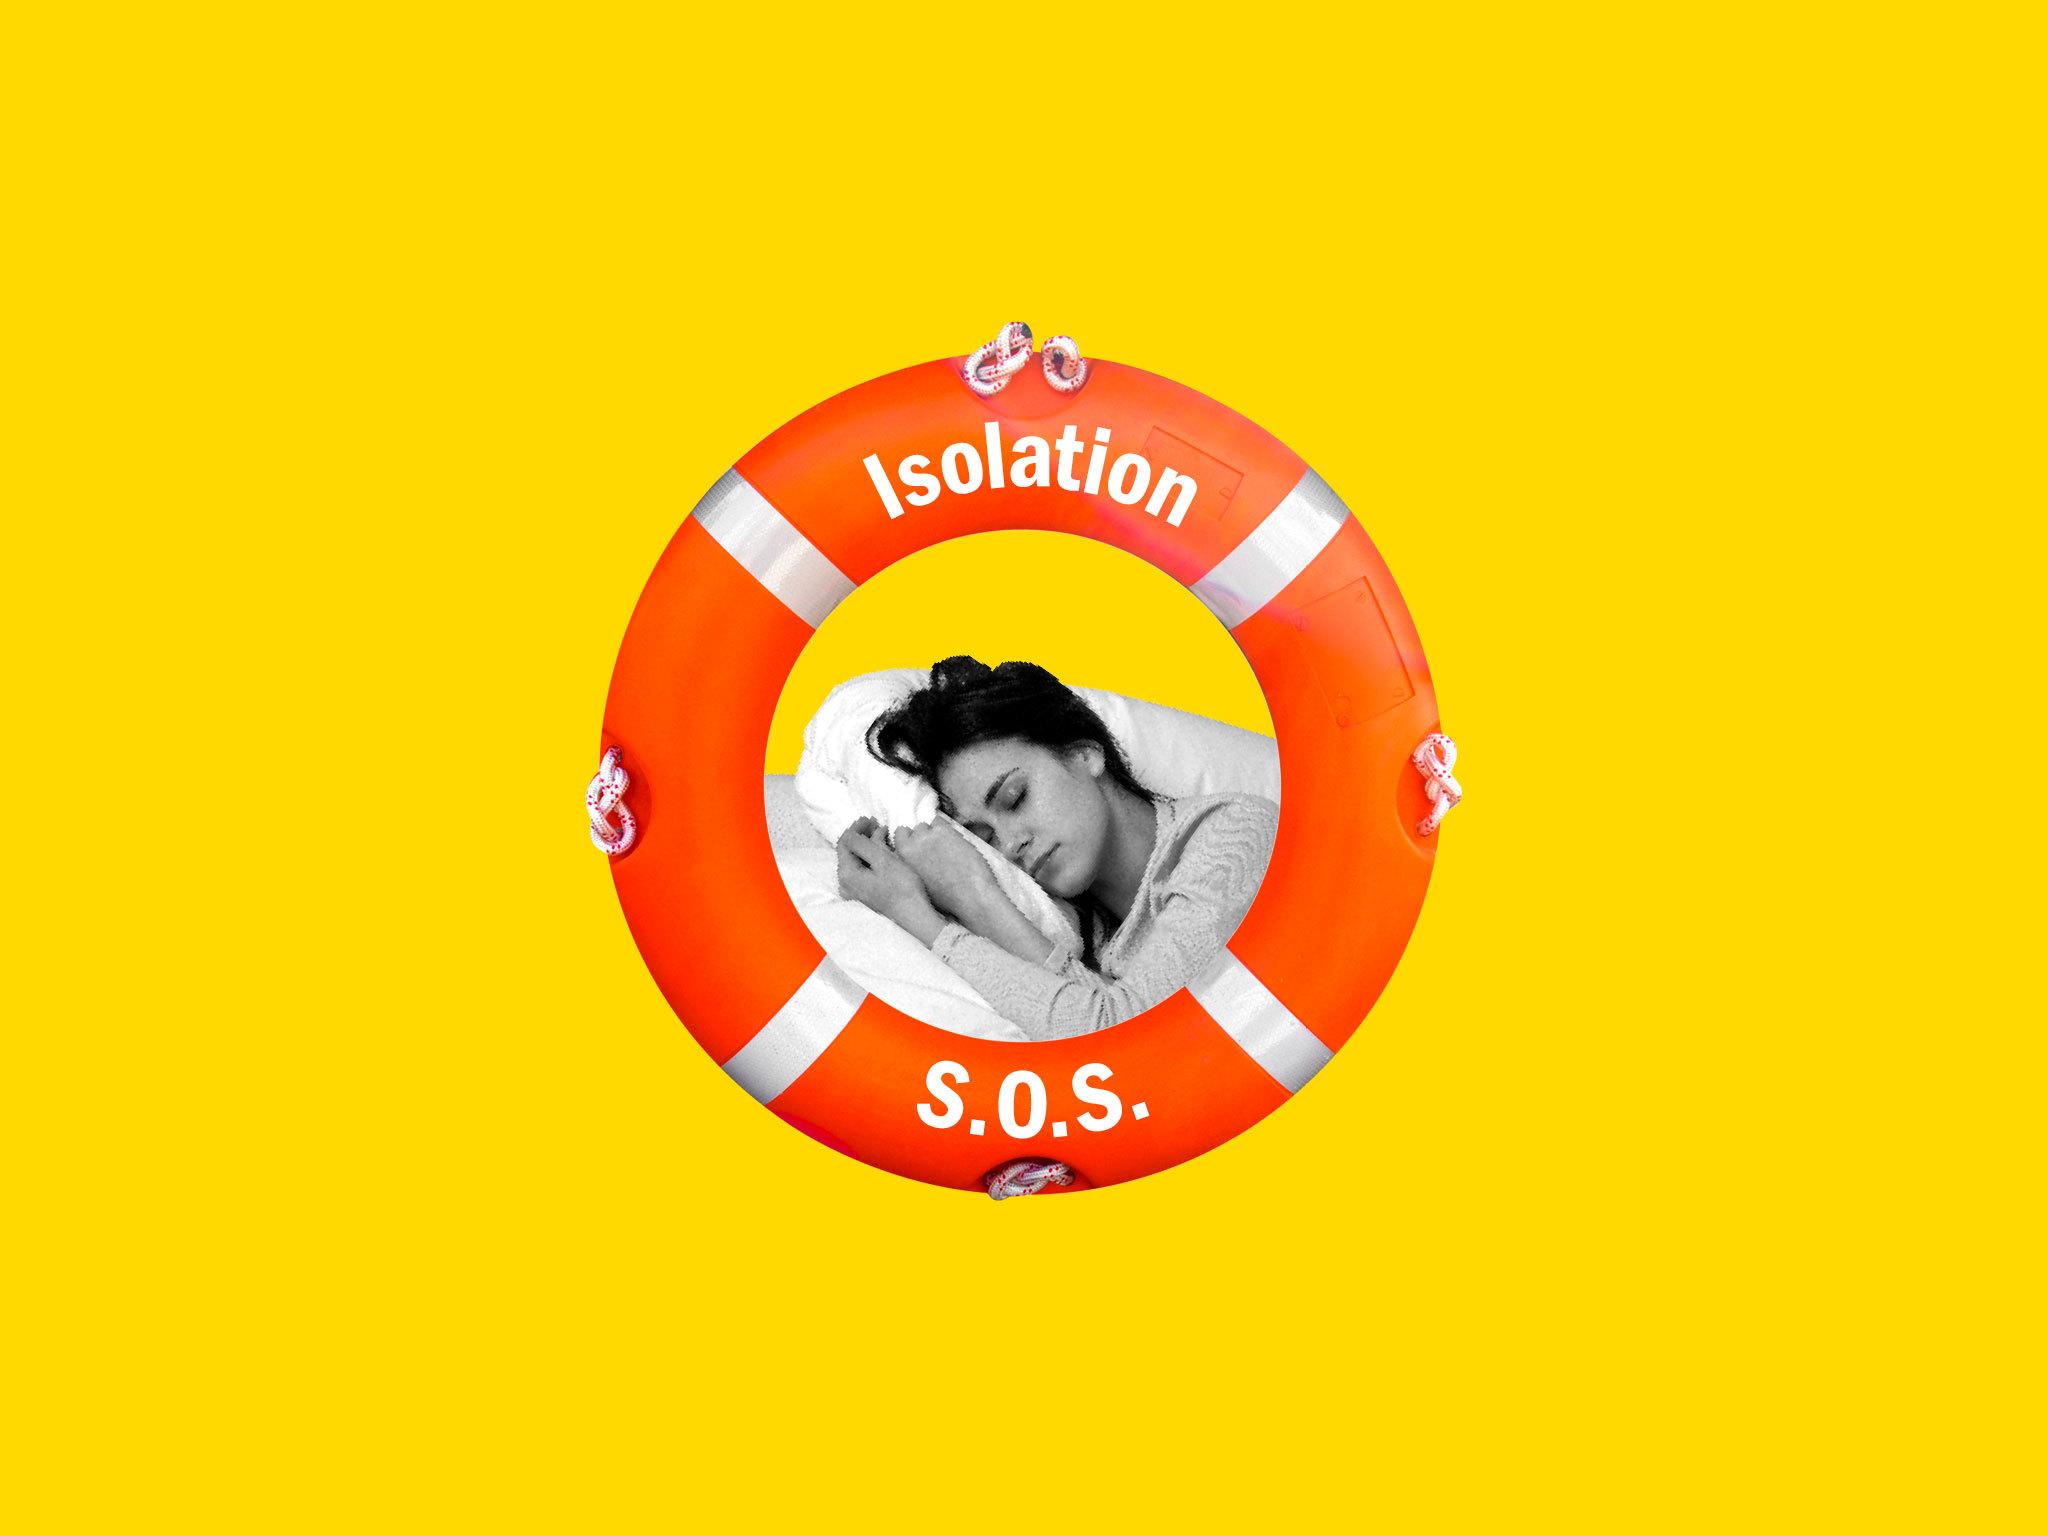 Isolation SOS